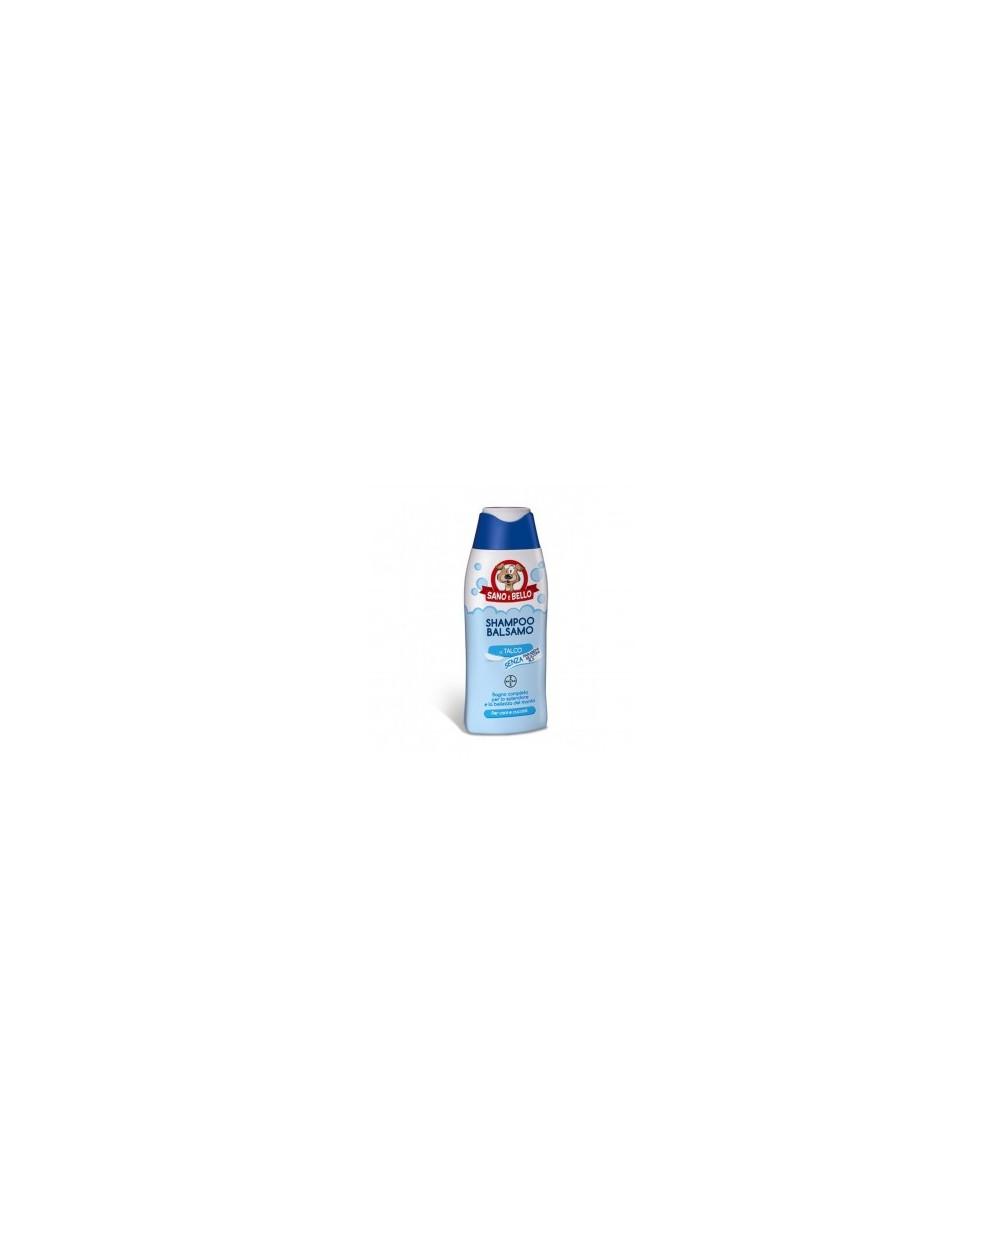 Bayer Shampoo Balsamo Talco